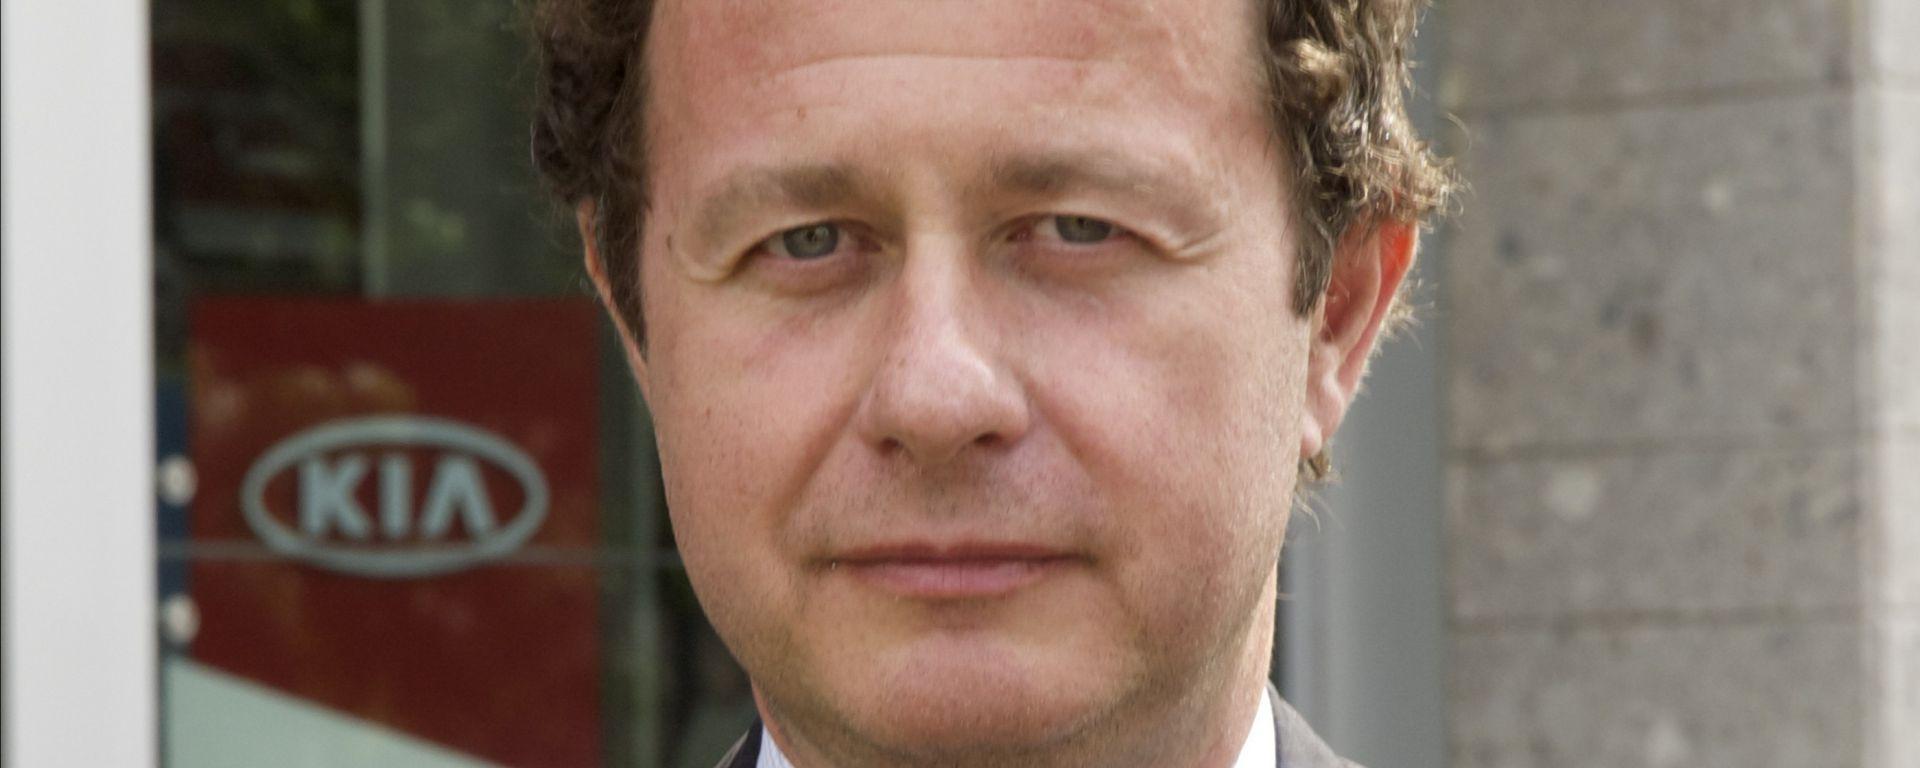 Giuseppe Bitti di Kia Italia votato Top Manager 2015